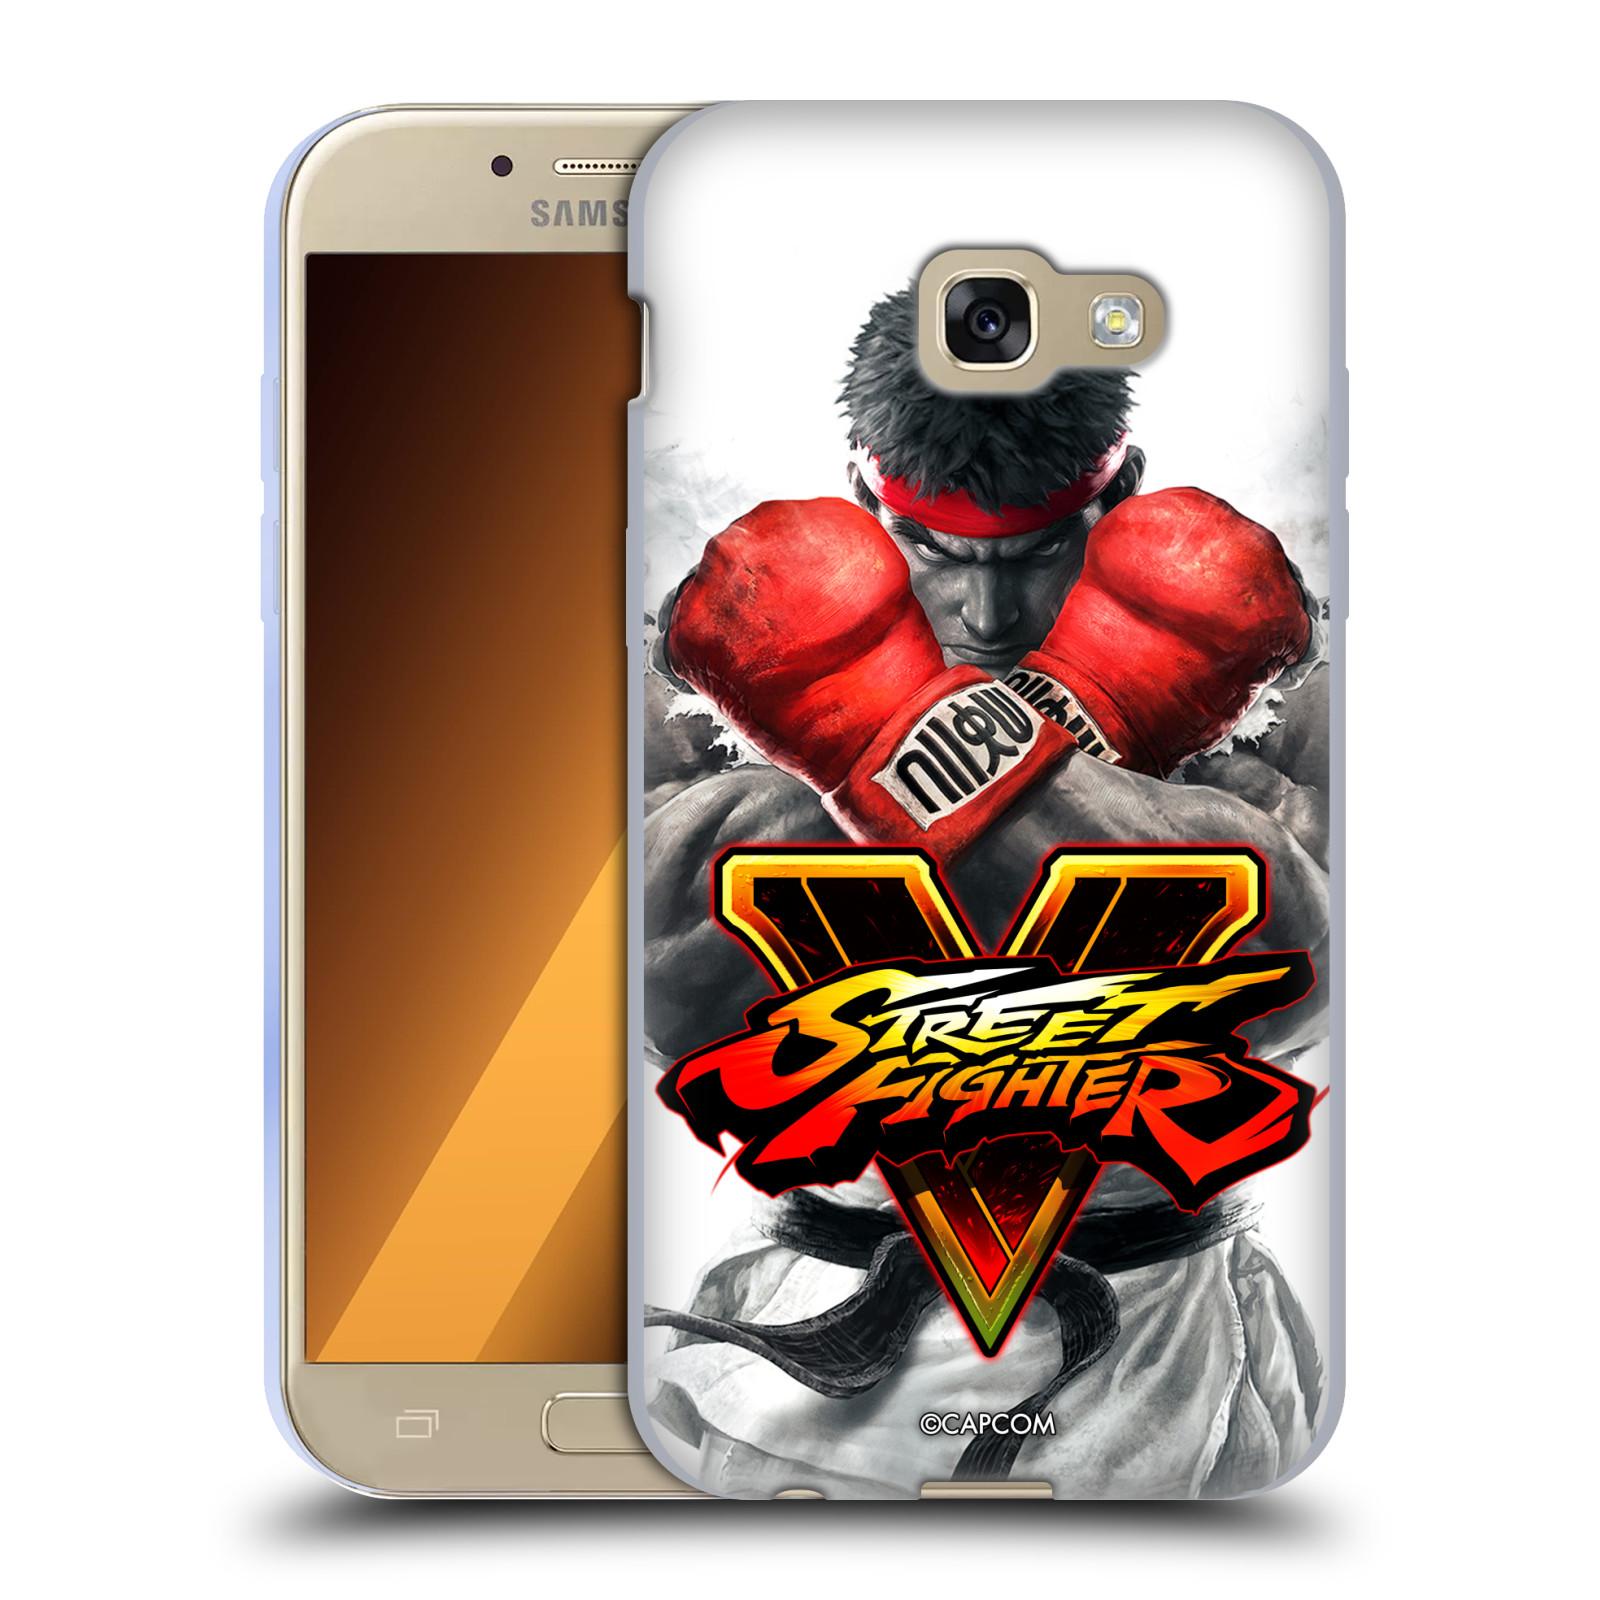 HEAD CASE silikonový obal na mobil Samsung Galaxy A5 2017 (A520) oficiální kryt STREET FIGHTER Boxer Ryu